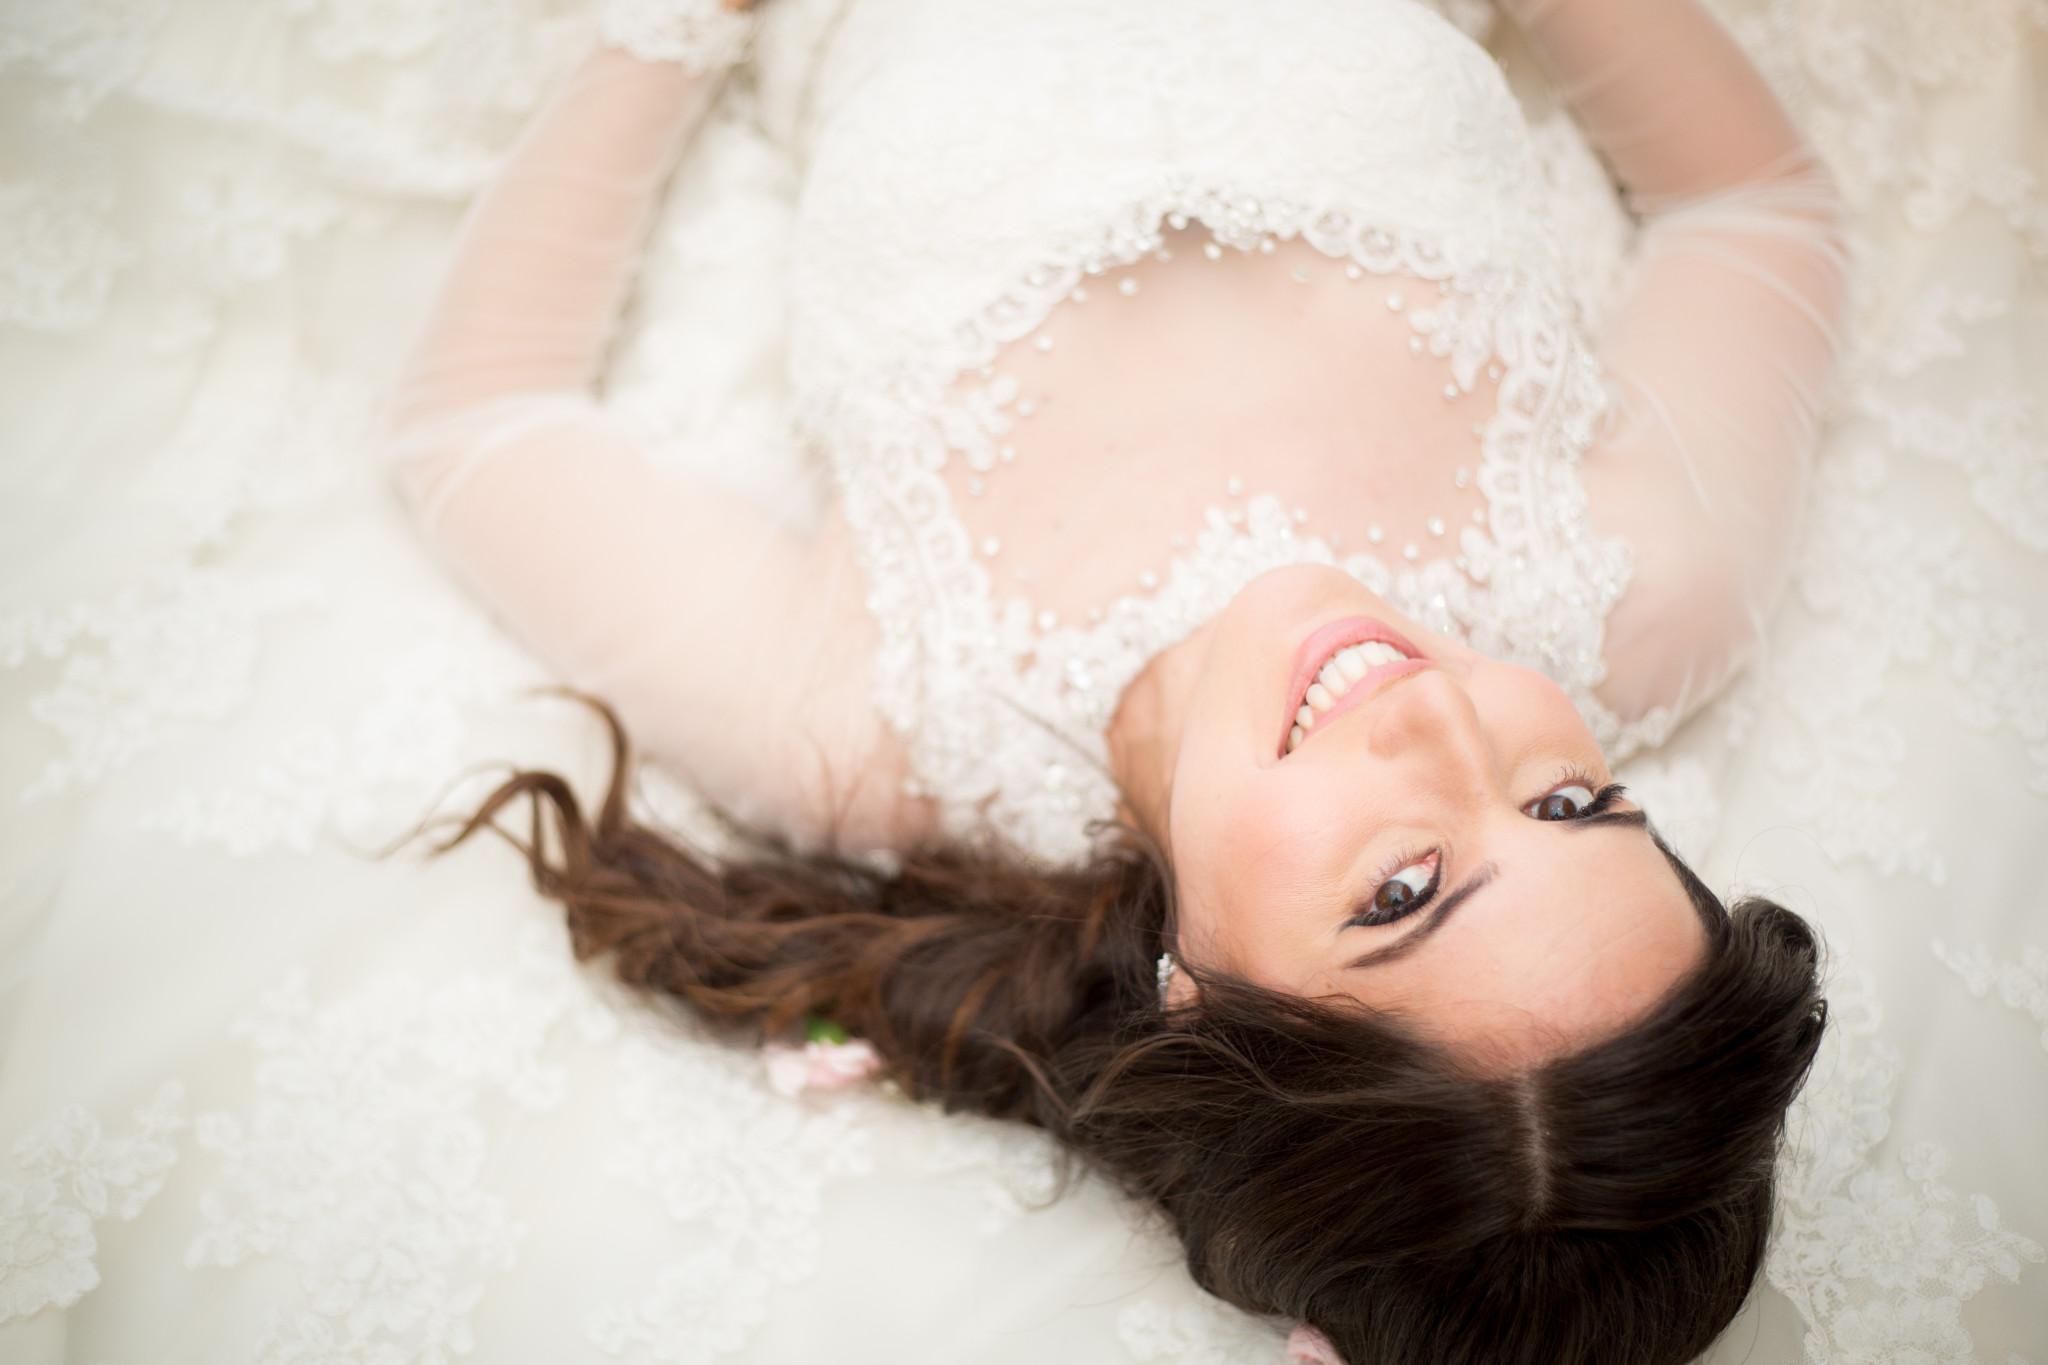 Wedding photographer in Miami bridal